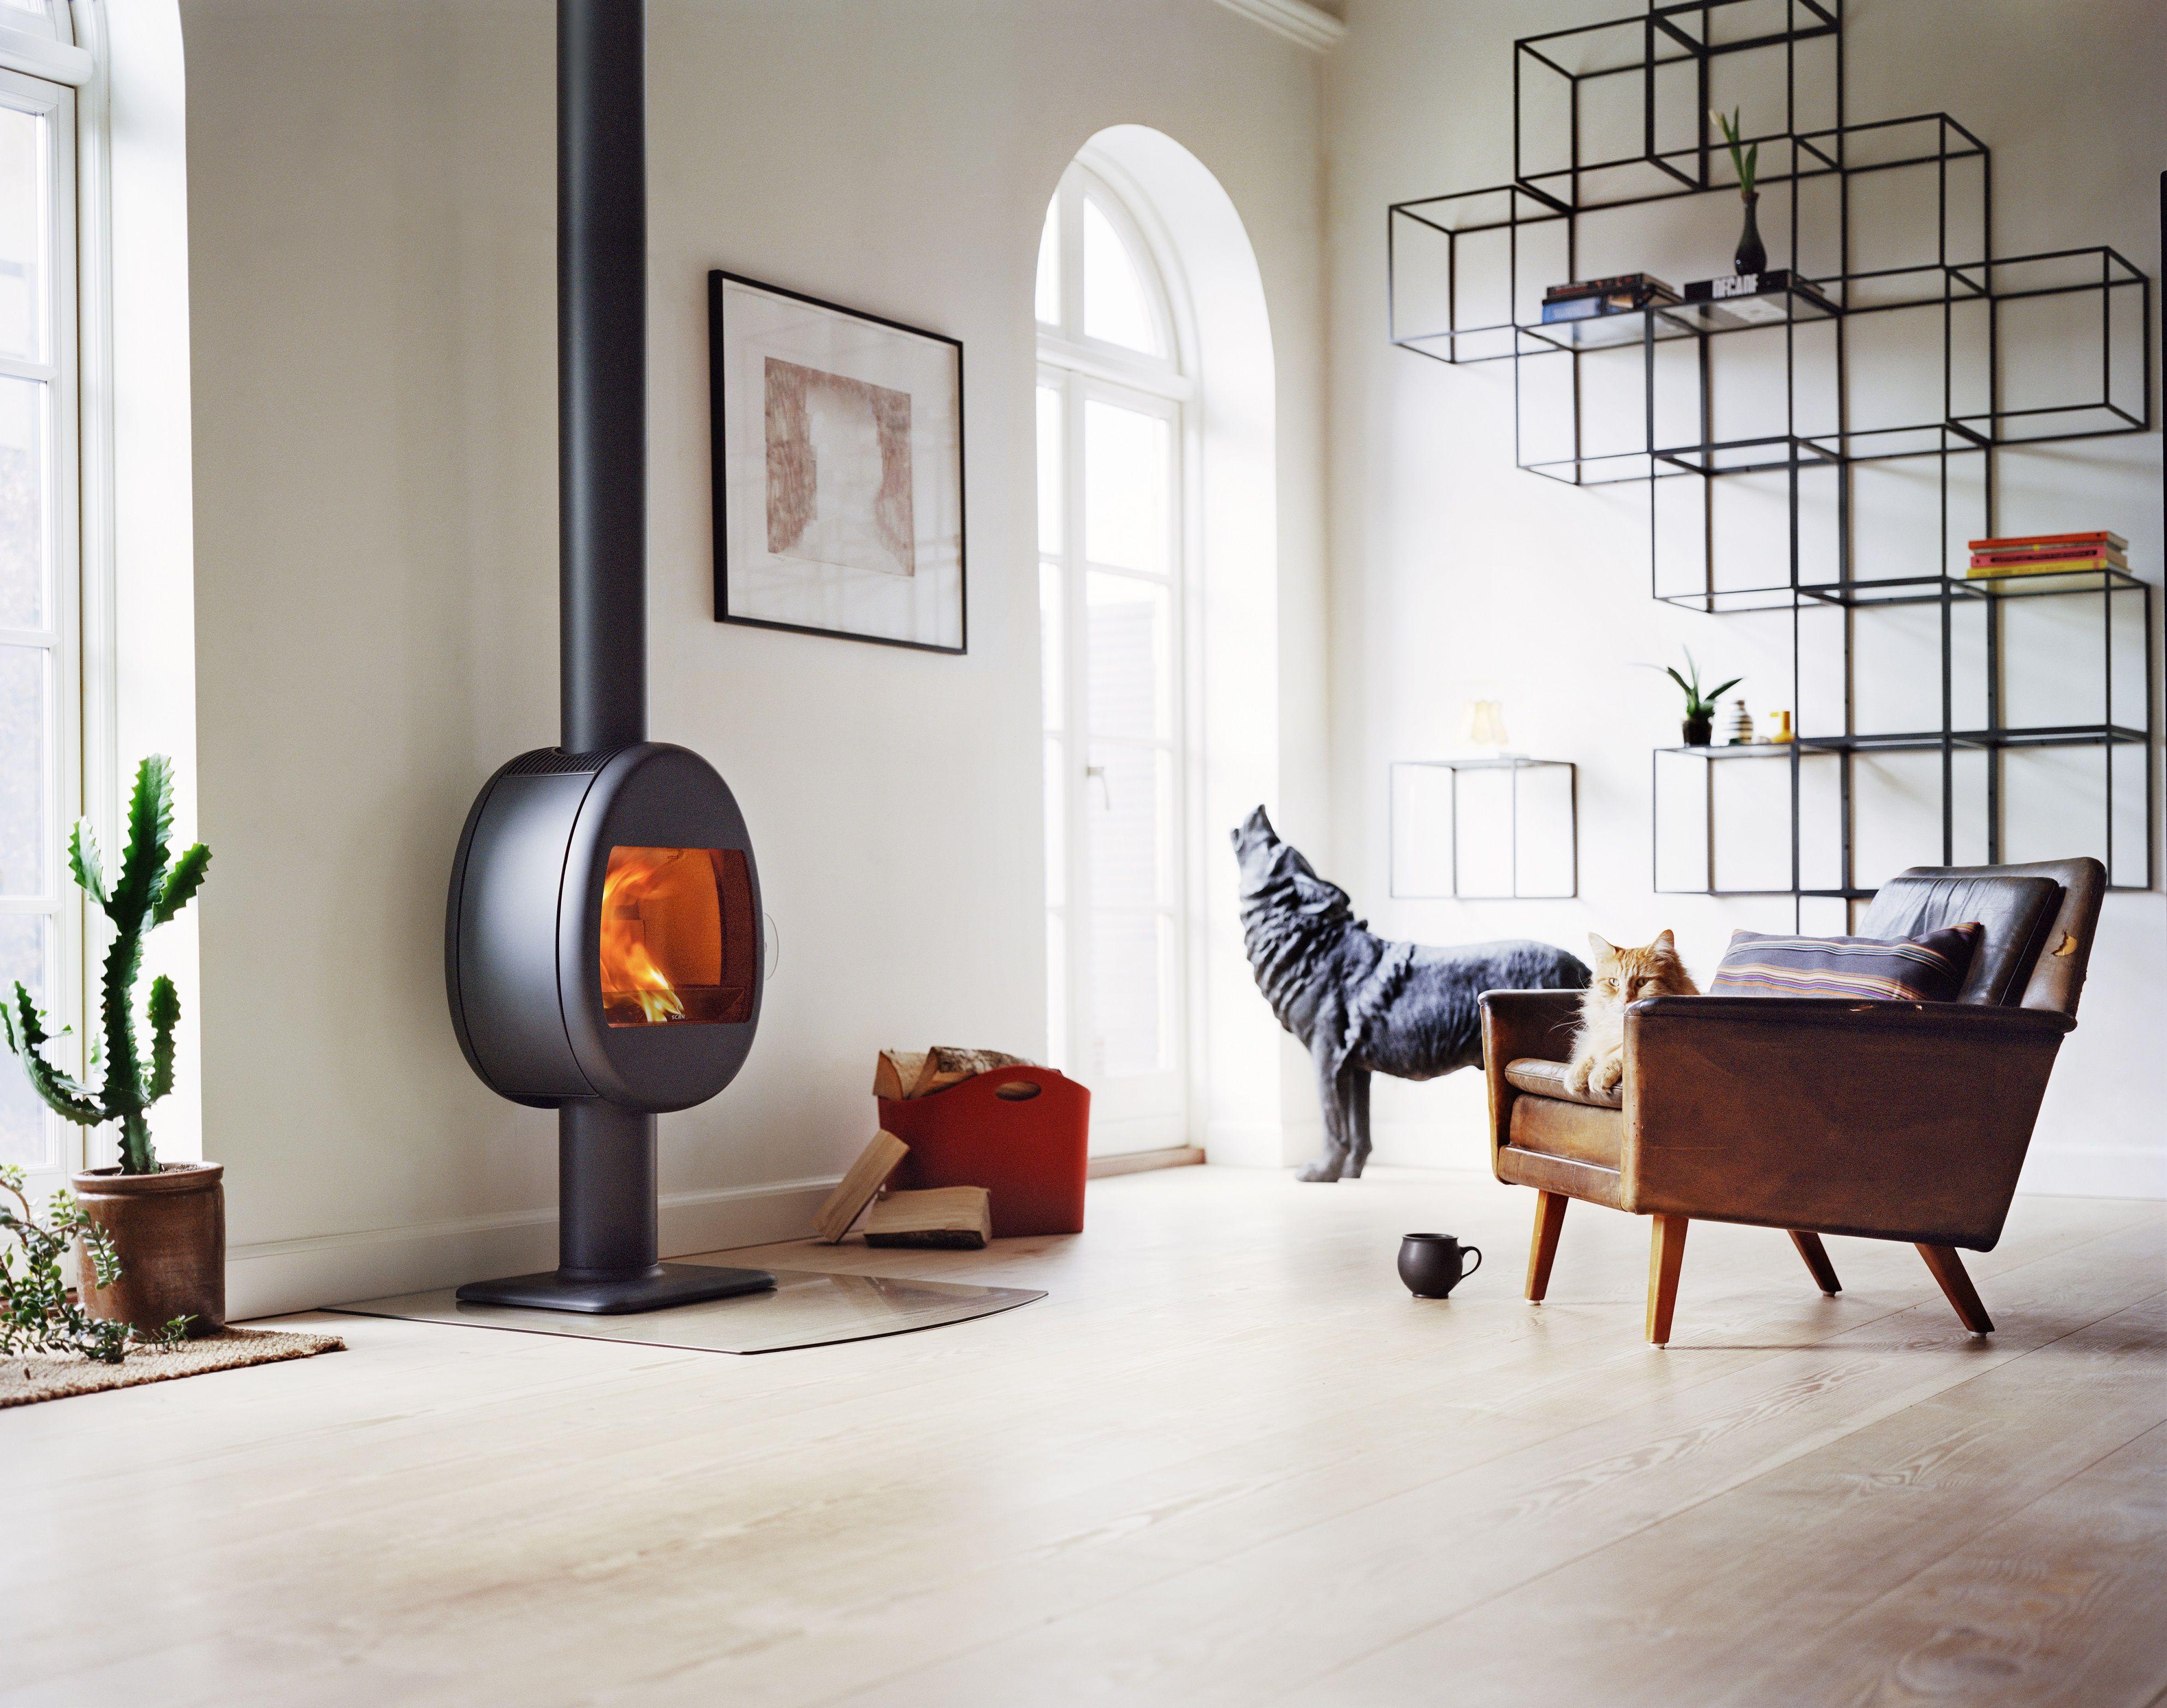 Stunning Scan 66 2 Pedestal base woodburning stove in black also